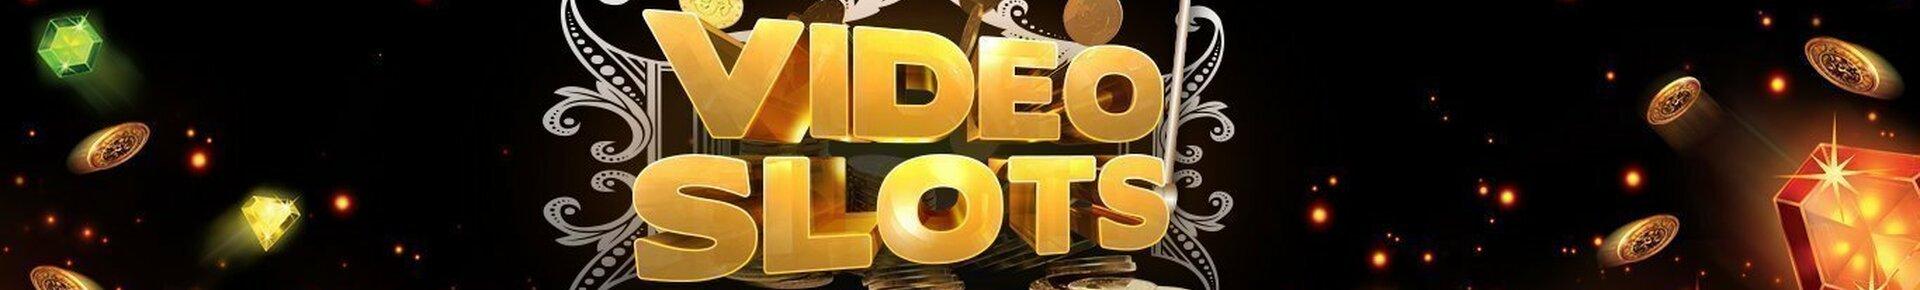 Videoslots.com casino review UK